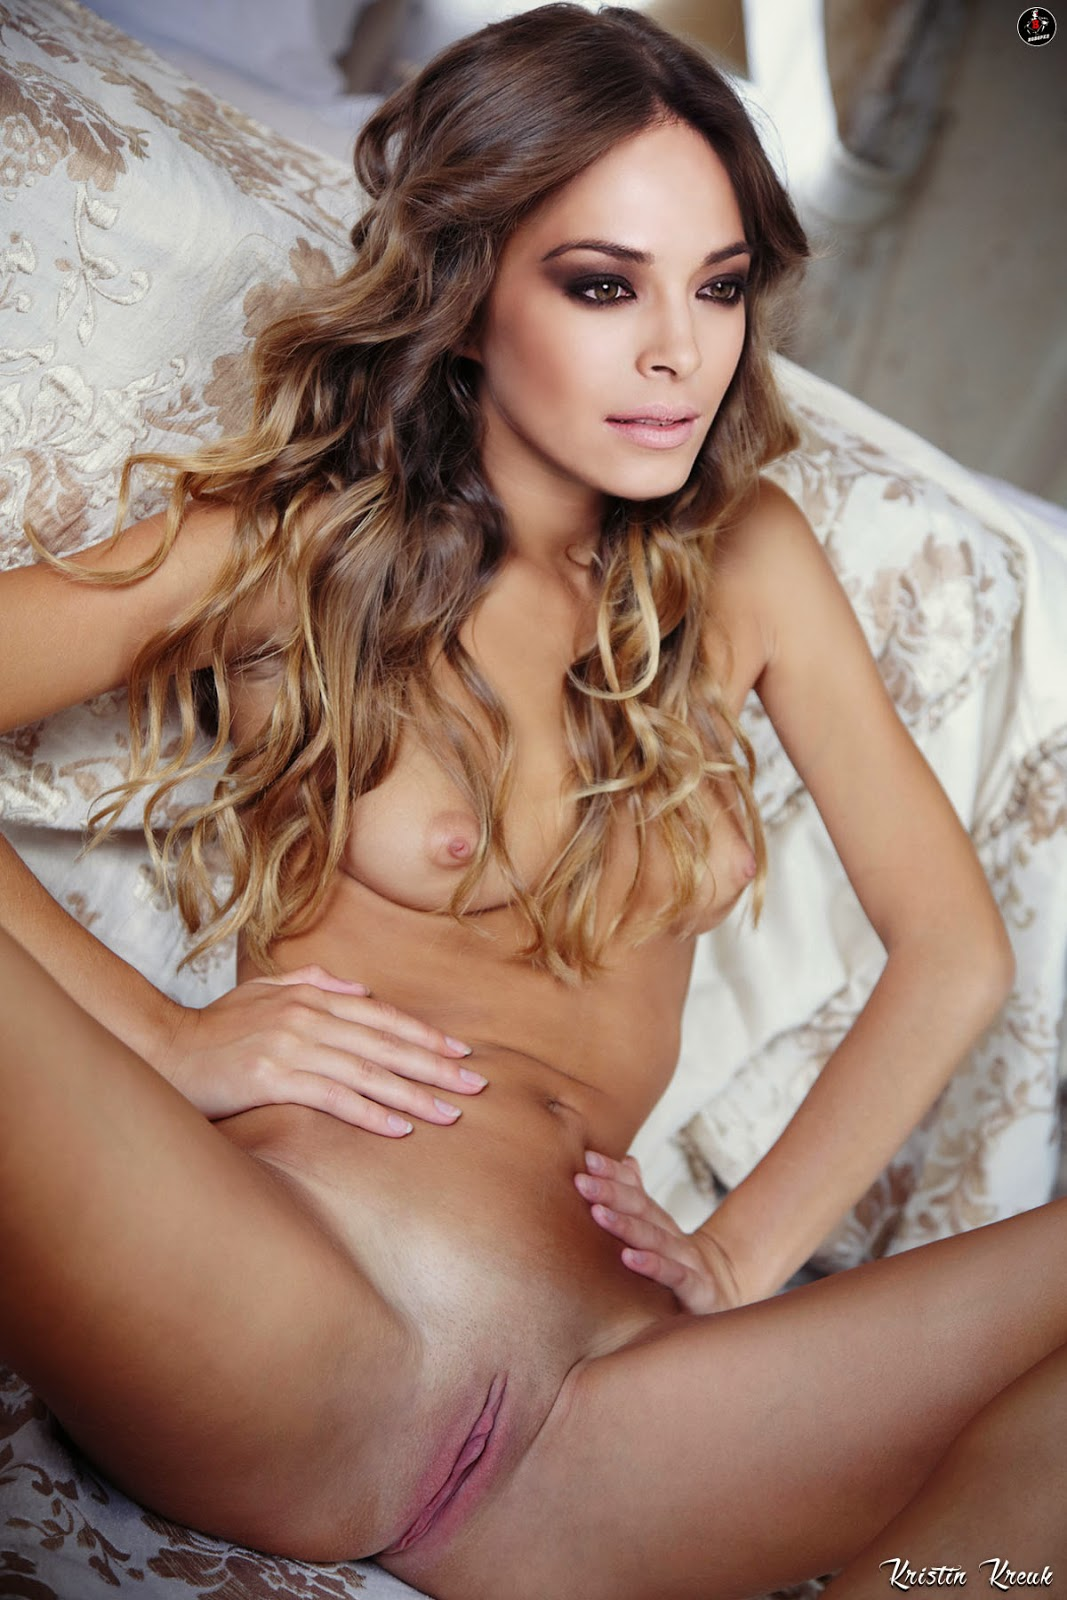 Kristin naked nina Nina North